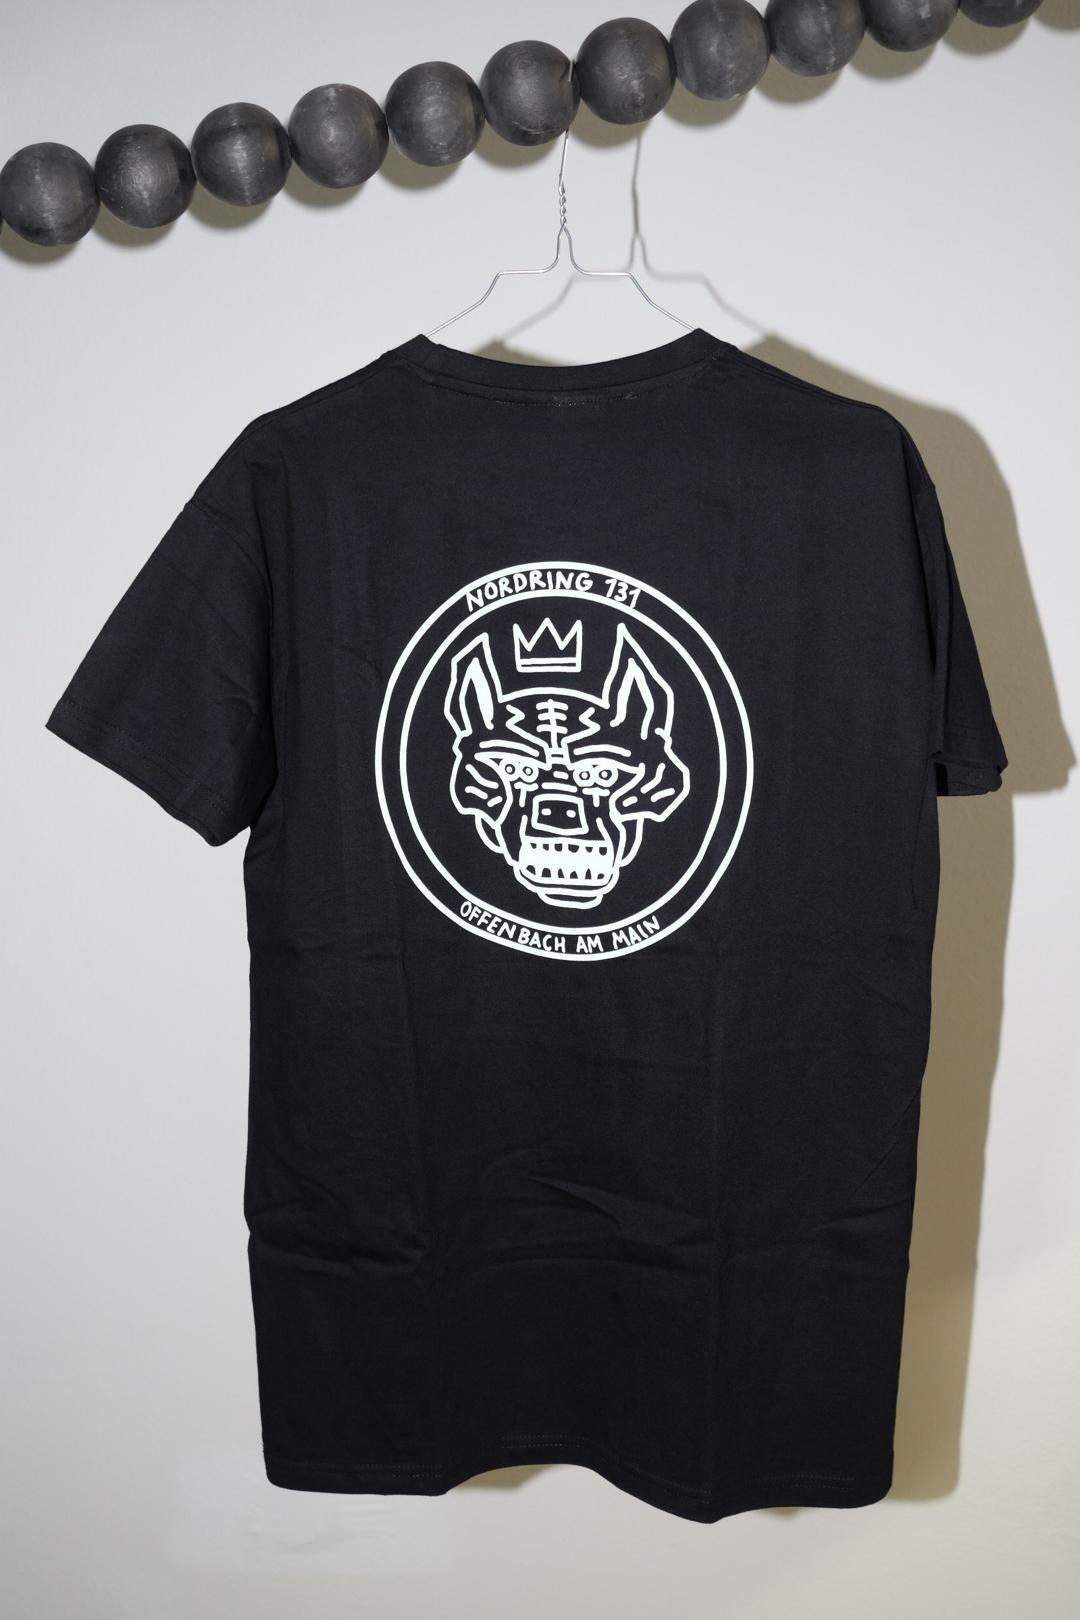 Nordring 131 T-Shirt 2